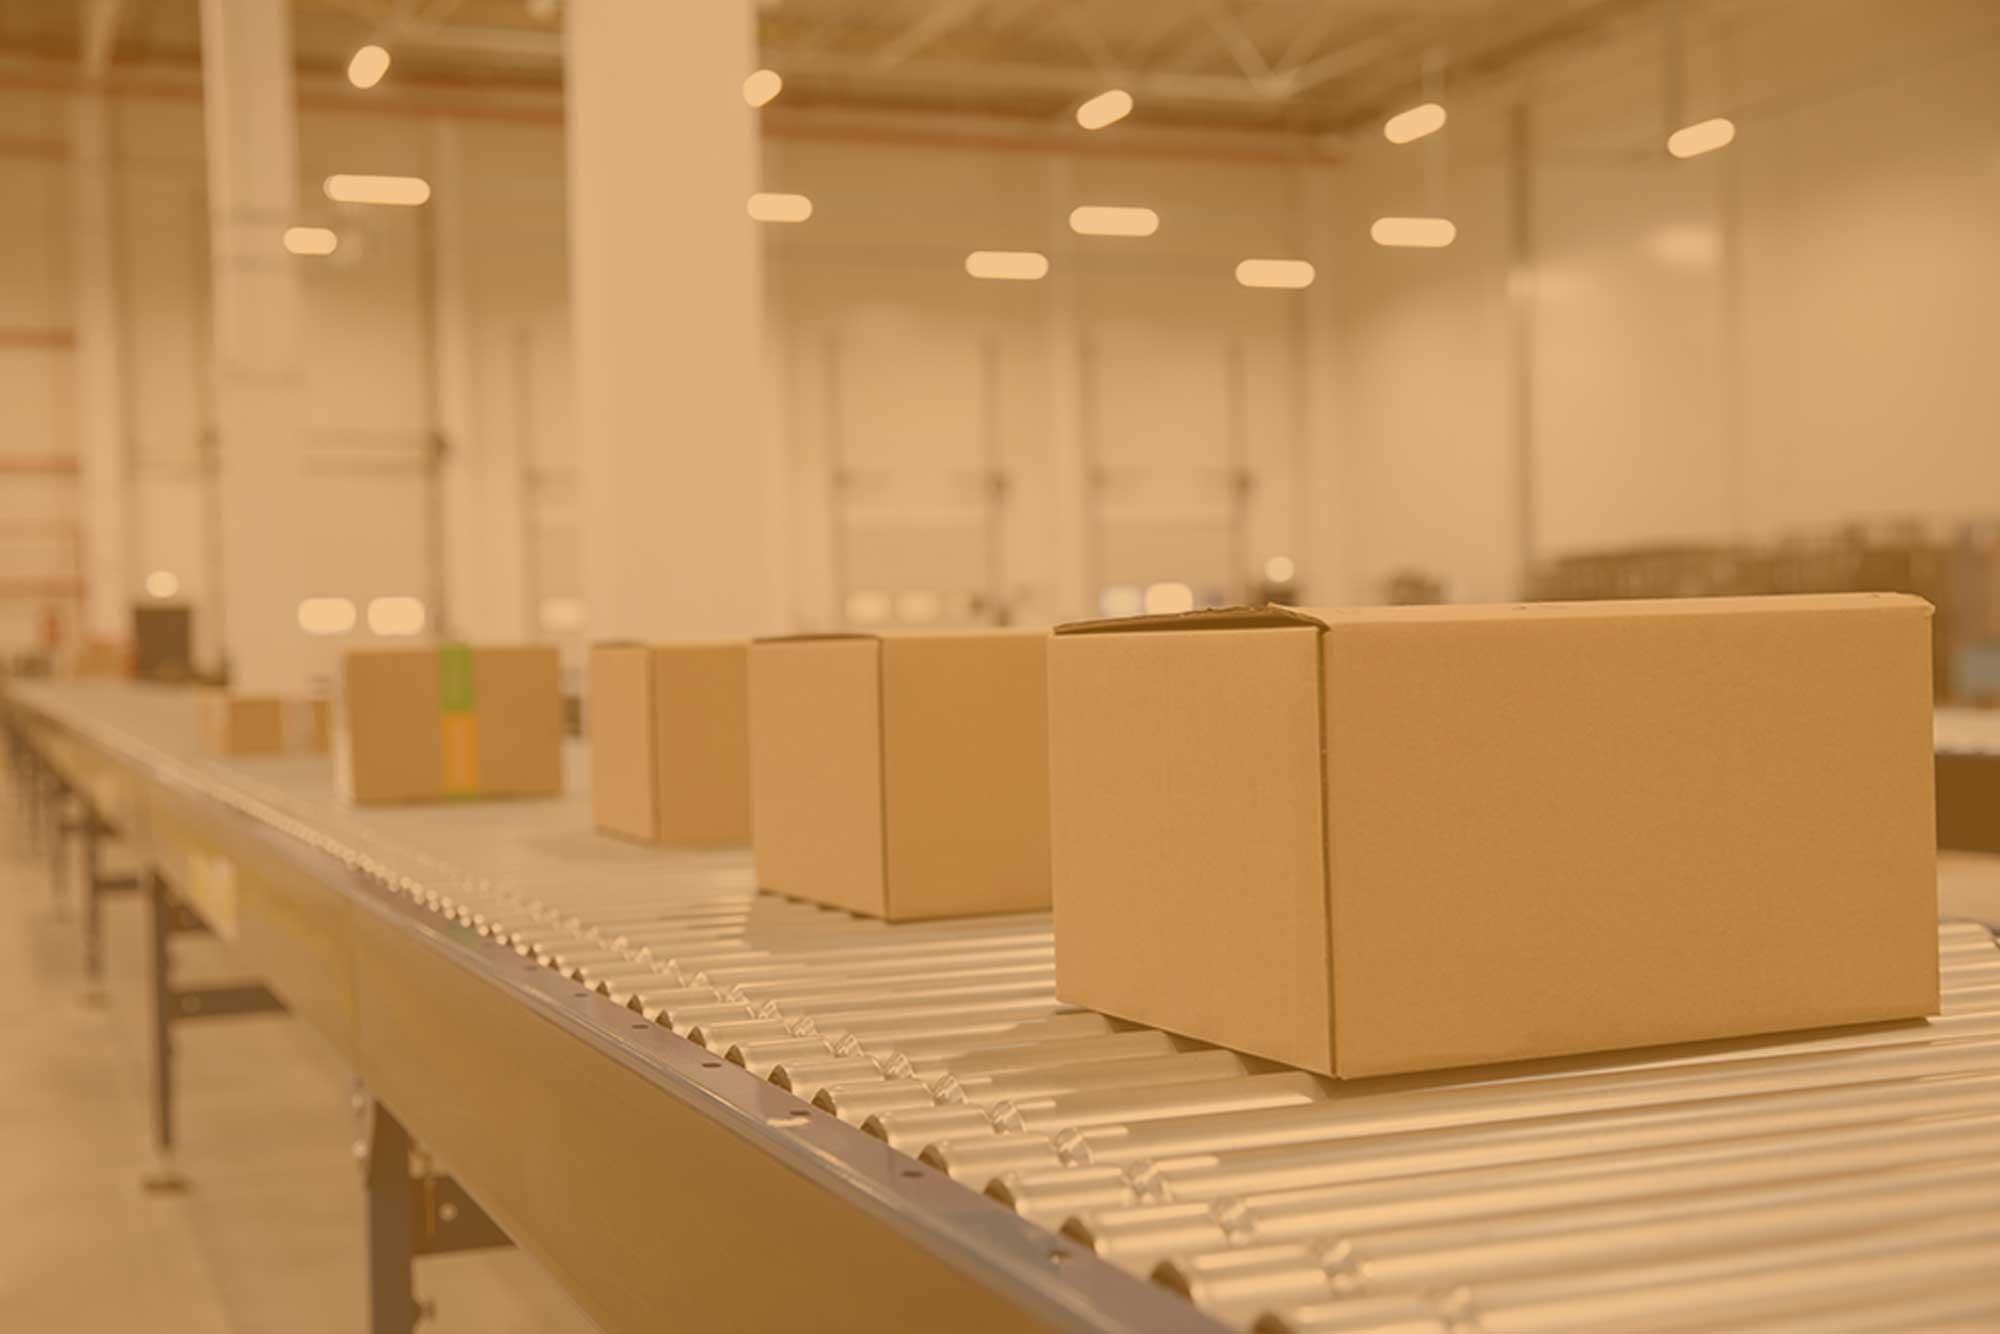 Krabice na míru ve skladu